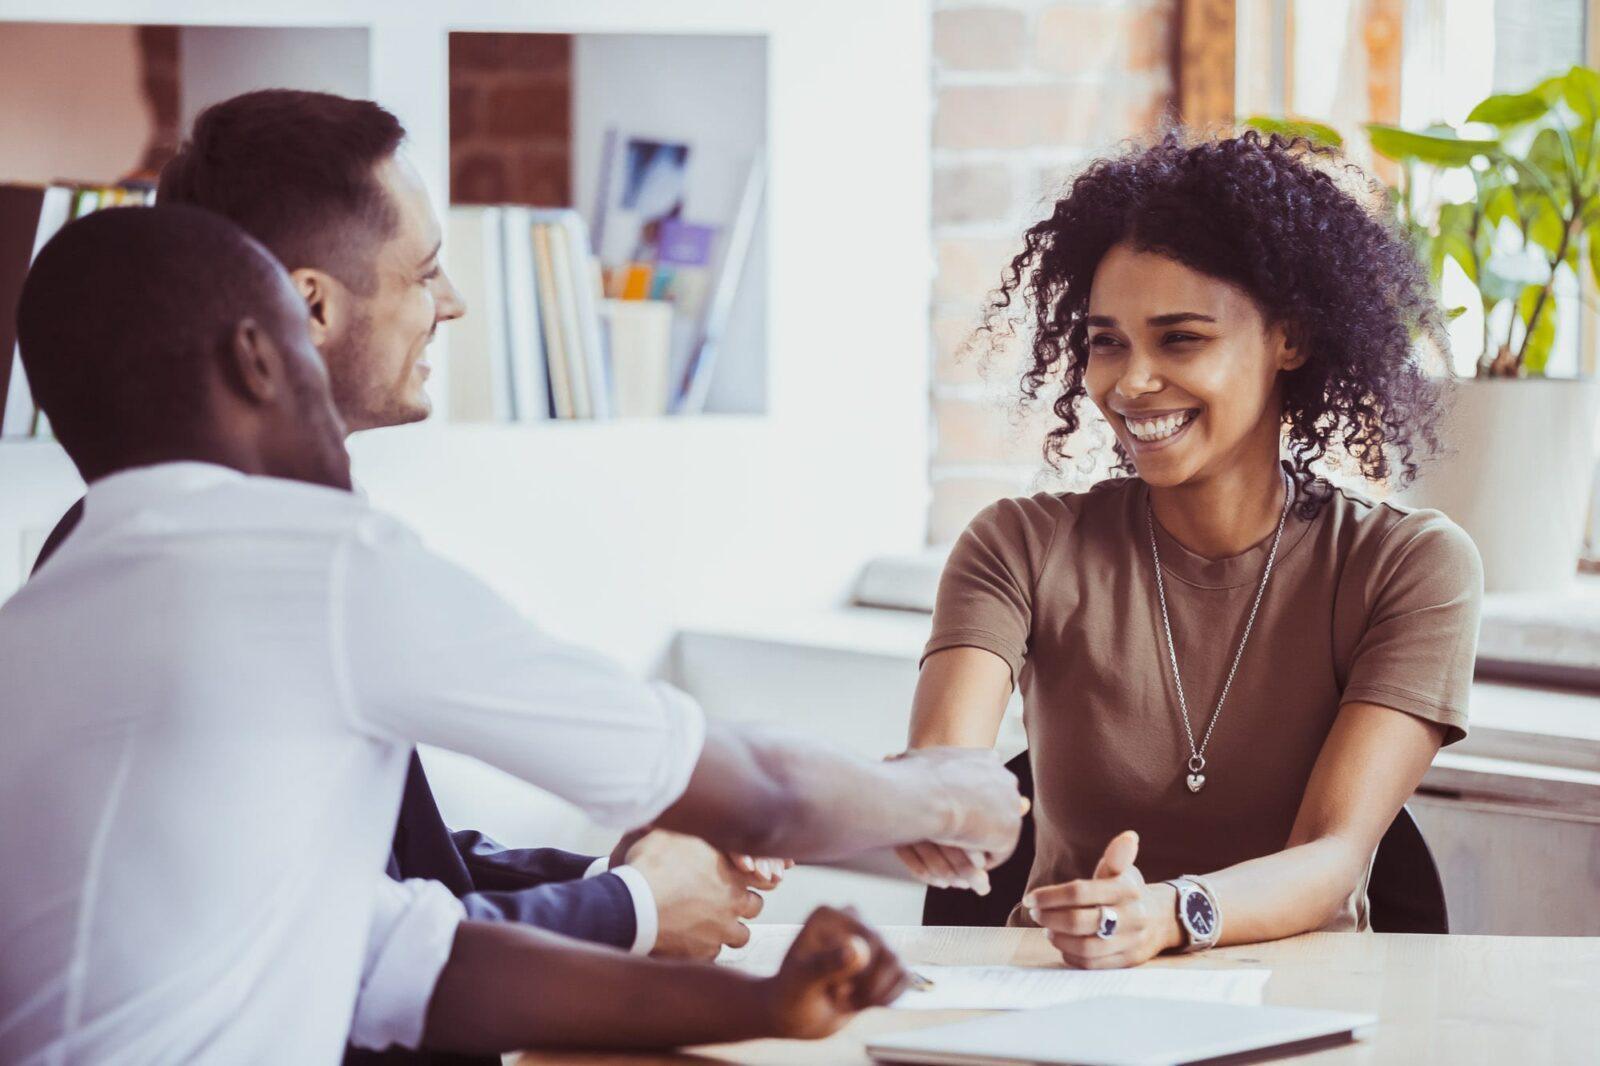 Benefits of employing a redundant worker